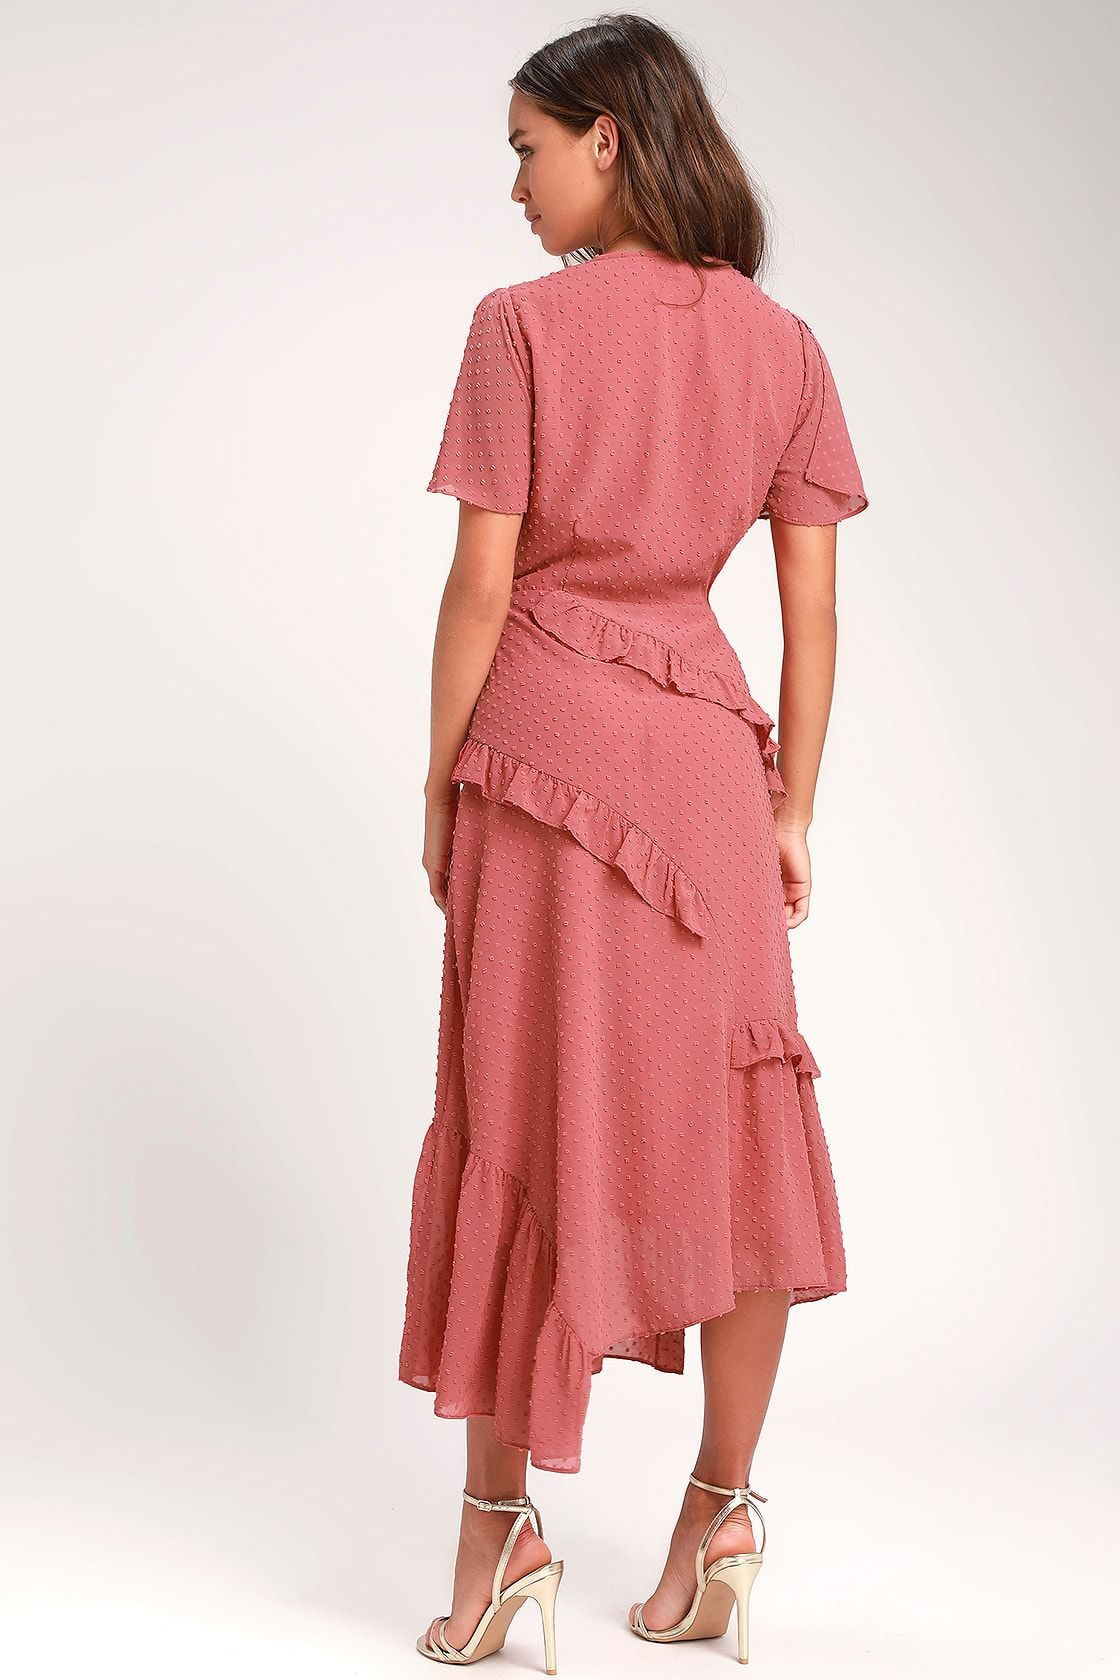 Next To You Rusty Rose Swiss Dot Ruffled Midi Dress In 2021 Midi Ruffle Dress Midi Dress Fashion [ 1680 x 1120 Pixel ]